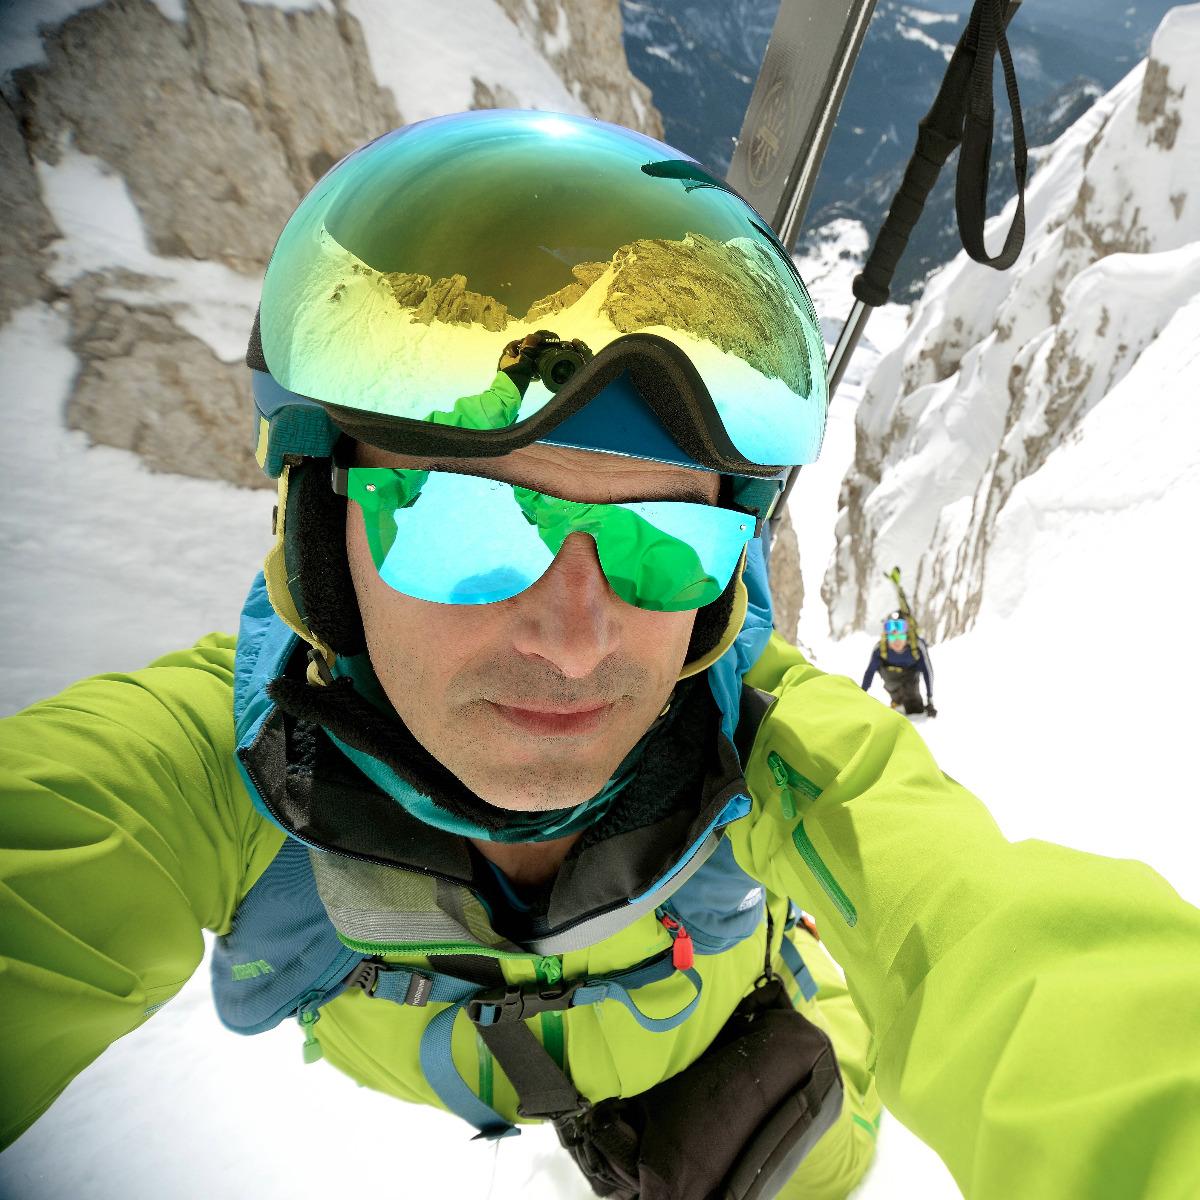 Arlberg raider 1